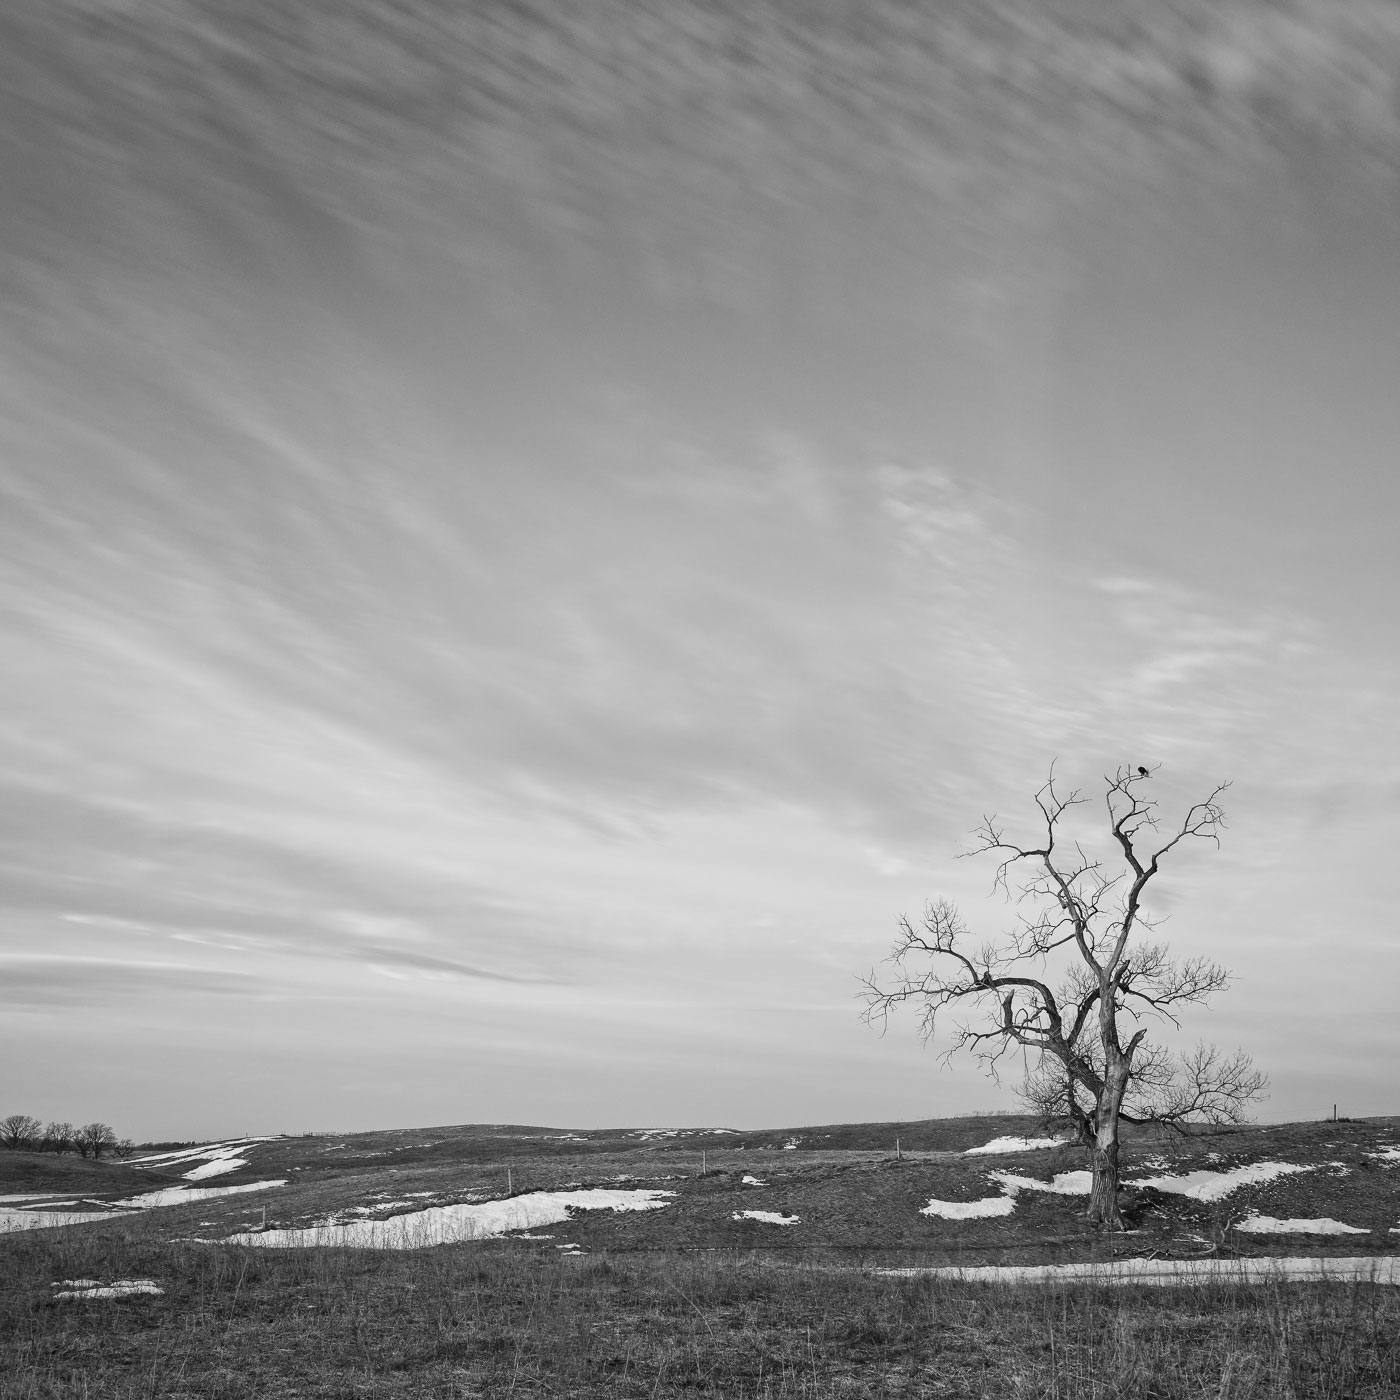 Late Winter, No Snow, Warm Weather  Nikon D800E + Nikon 16-35mm VR